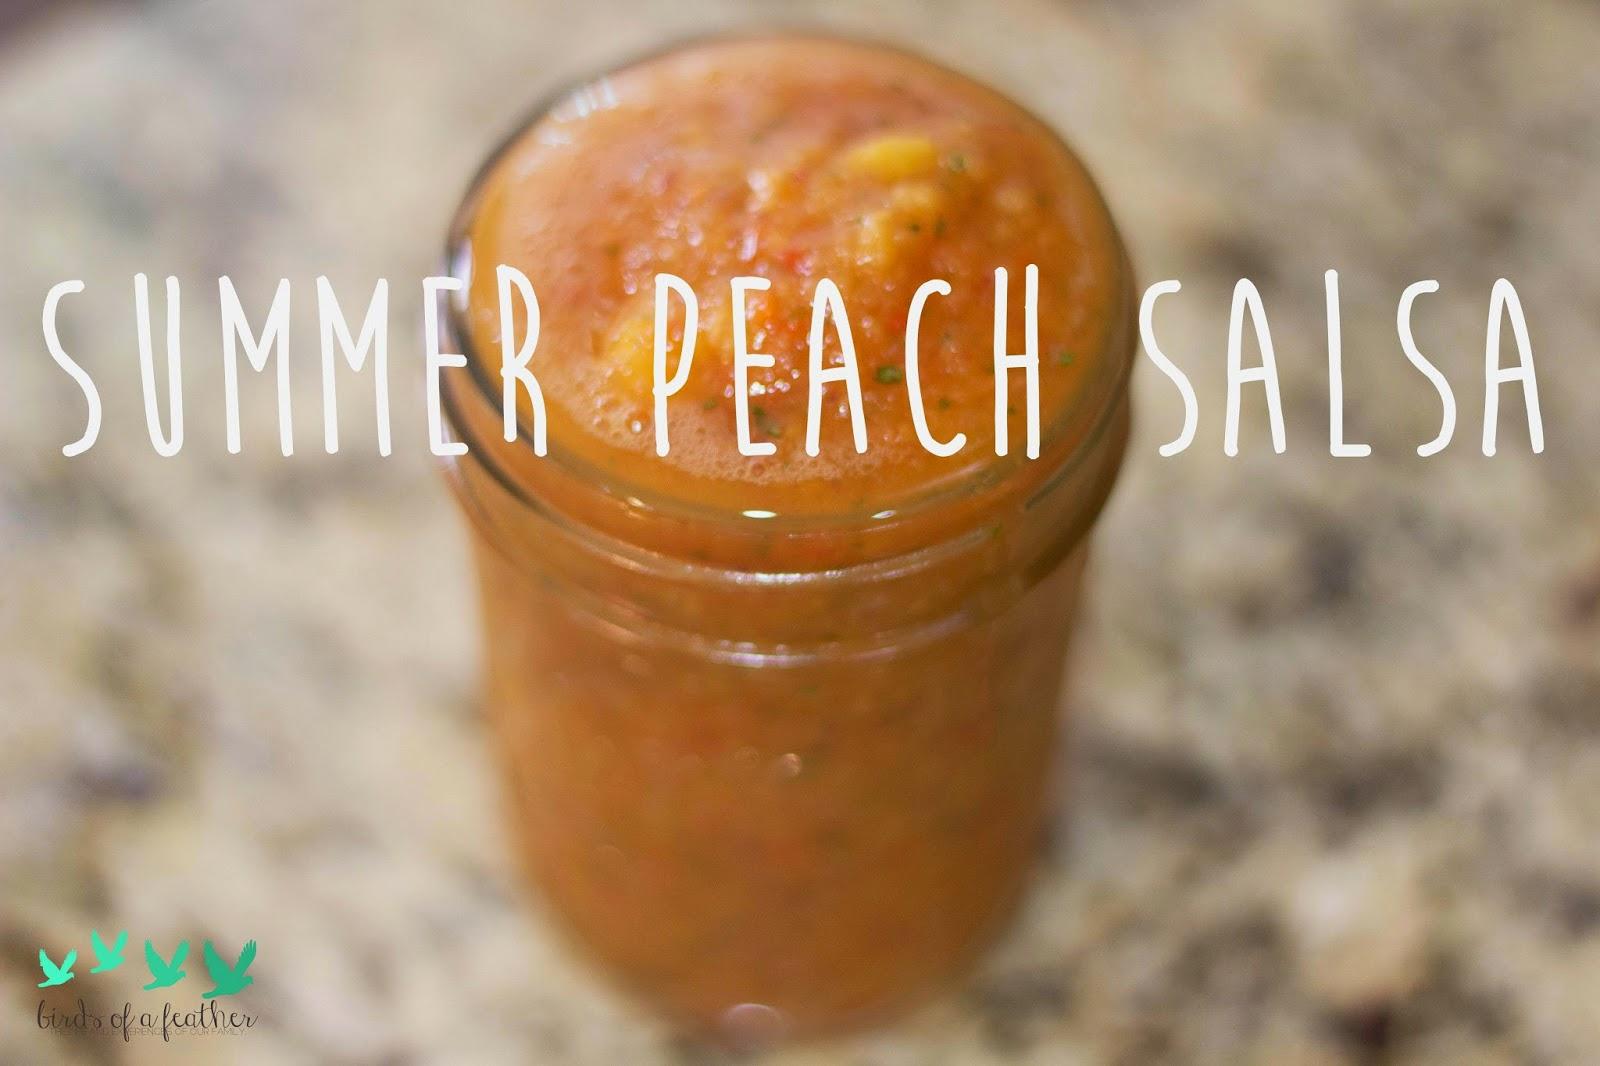 http://www.theweatheredpalate.com/2014/08/summer-peach-salsa.html